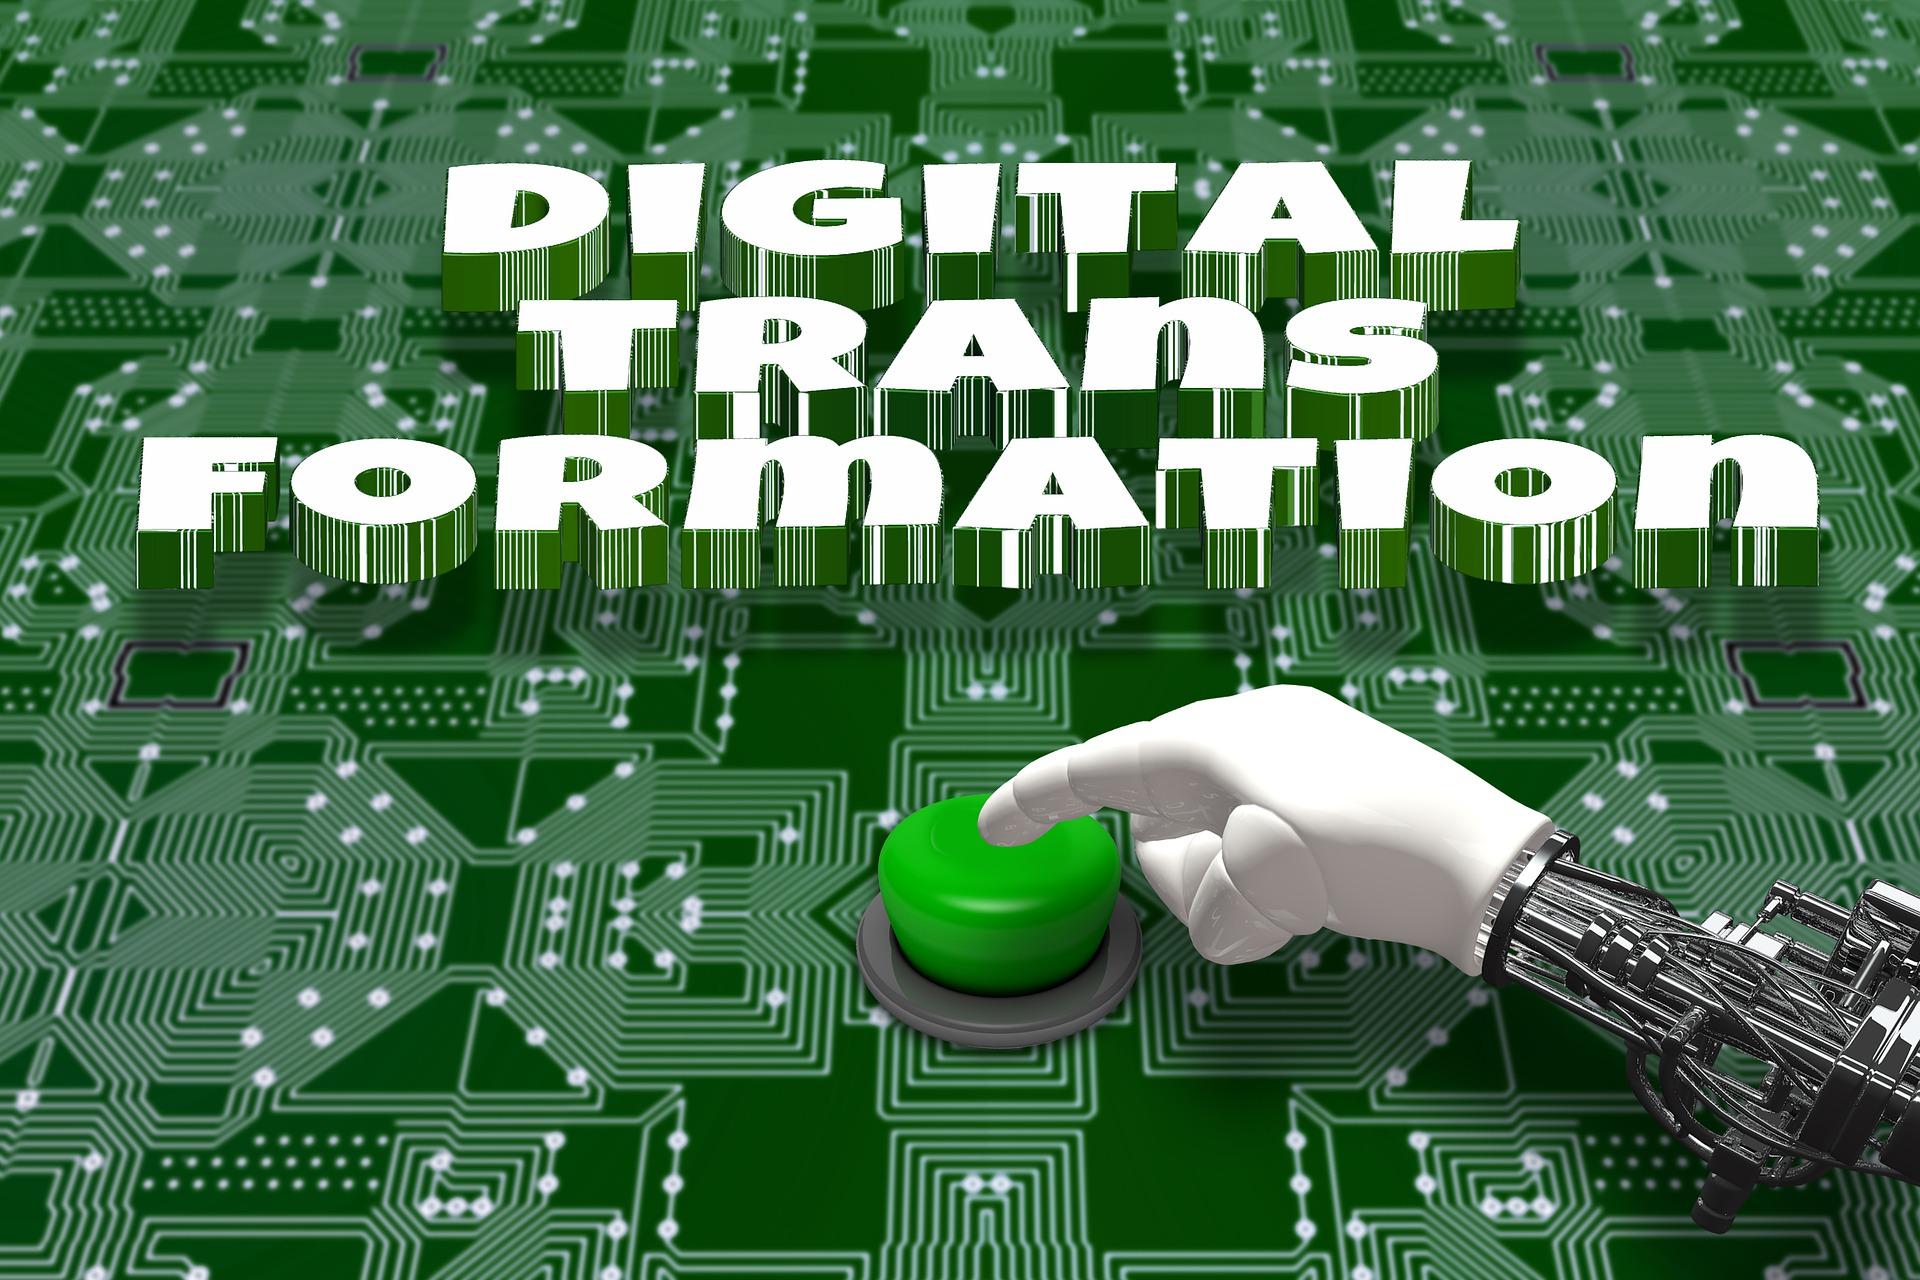 digitization-4482553_1920